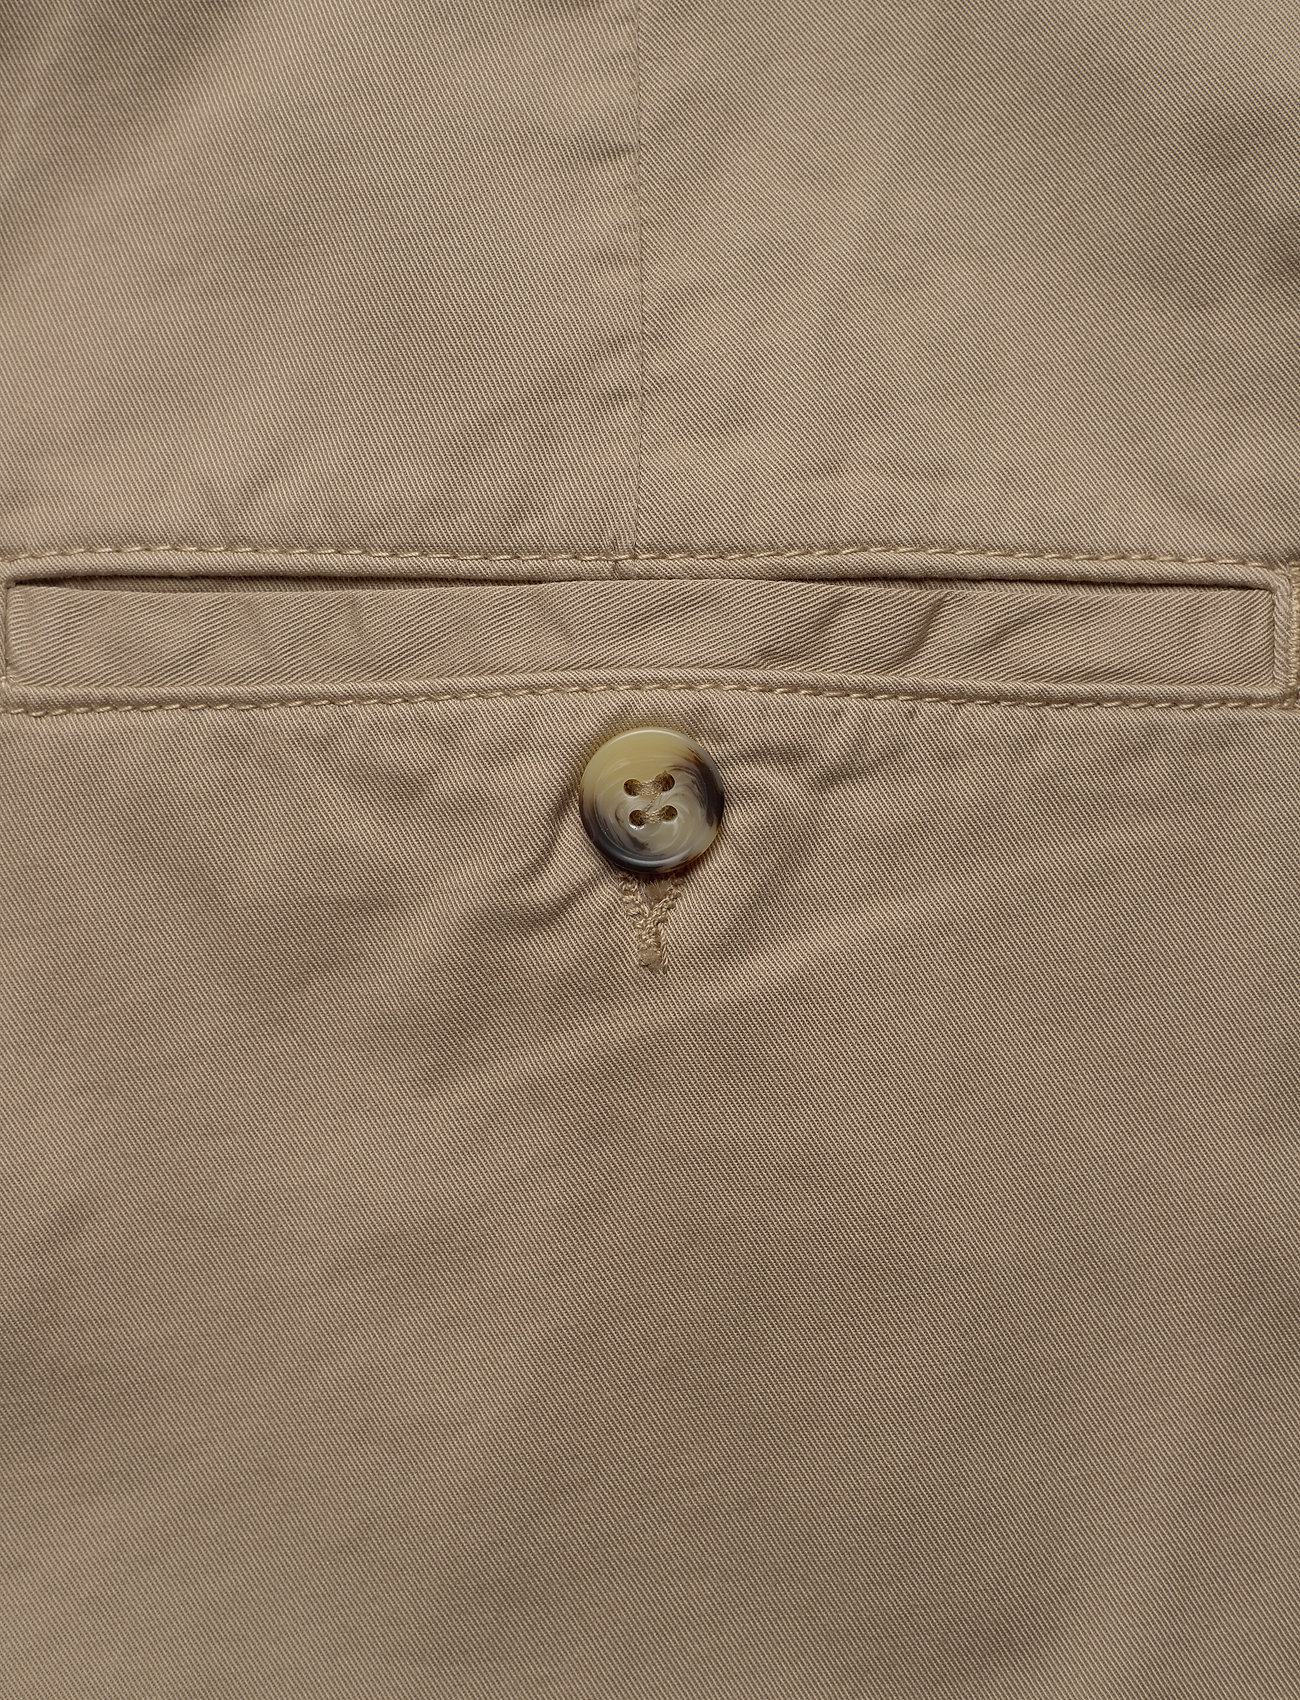 Hope - News Edit Trousers - casual bukser - khaki beige - 4